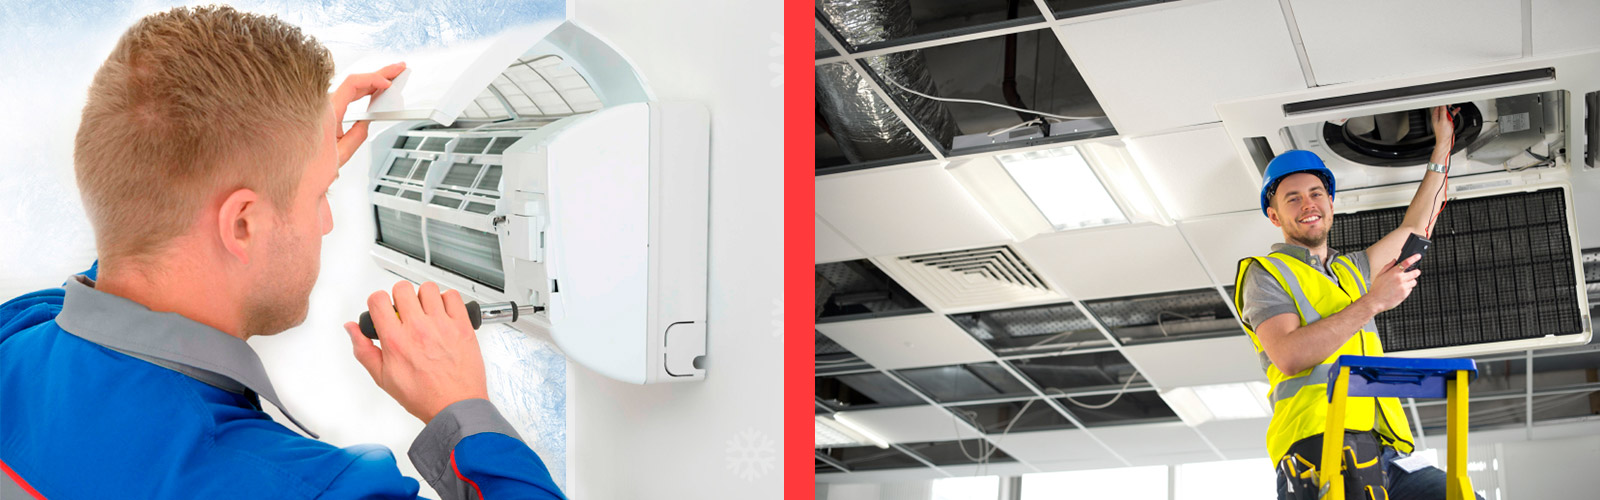 teléfono Reparación aire acondicionado doméstico, comercial e industrial en Alcalá de Henares